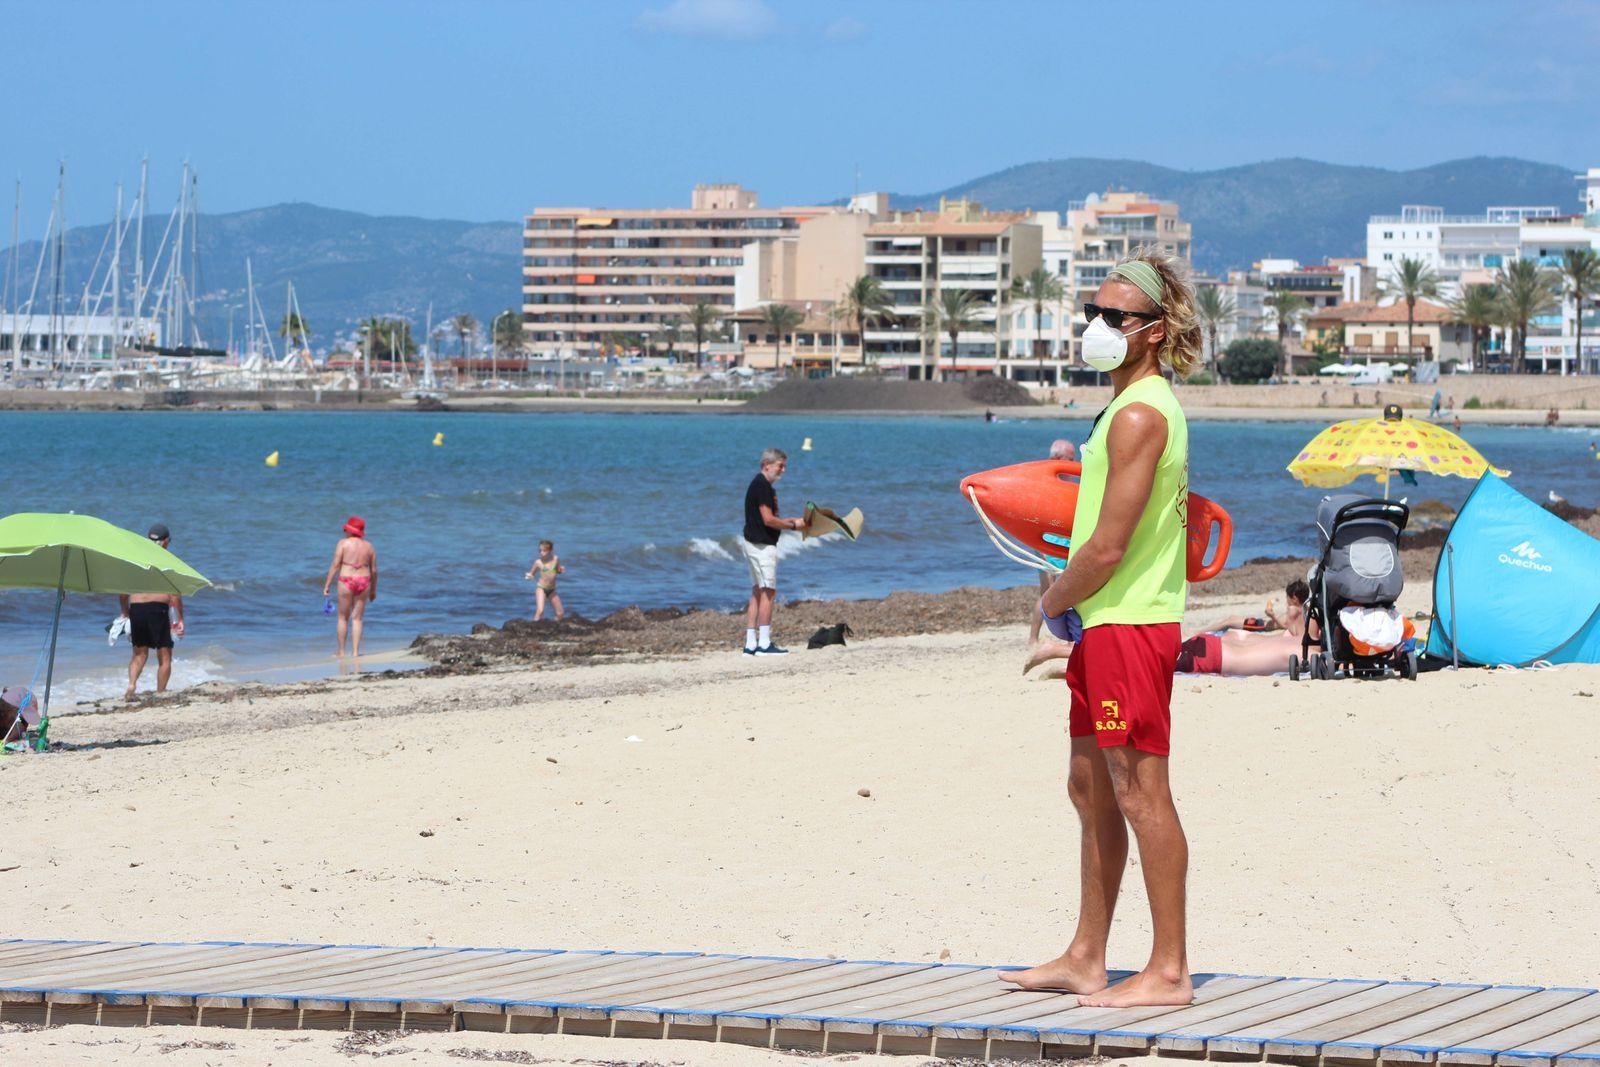 life guard in Palma de Mallorca Cordon Press *** life guard in Palma de Mallorca Cordon Press PUBLICATIONxINxGERxAUTxSUI